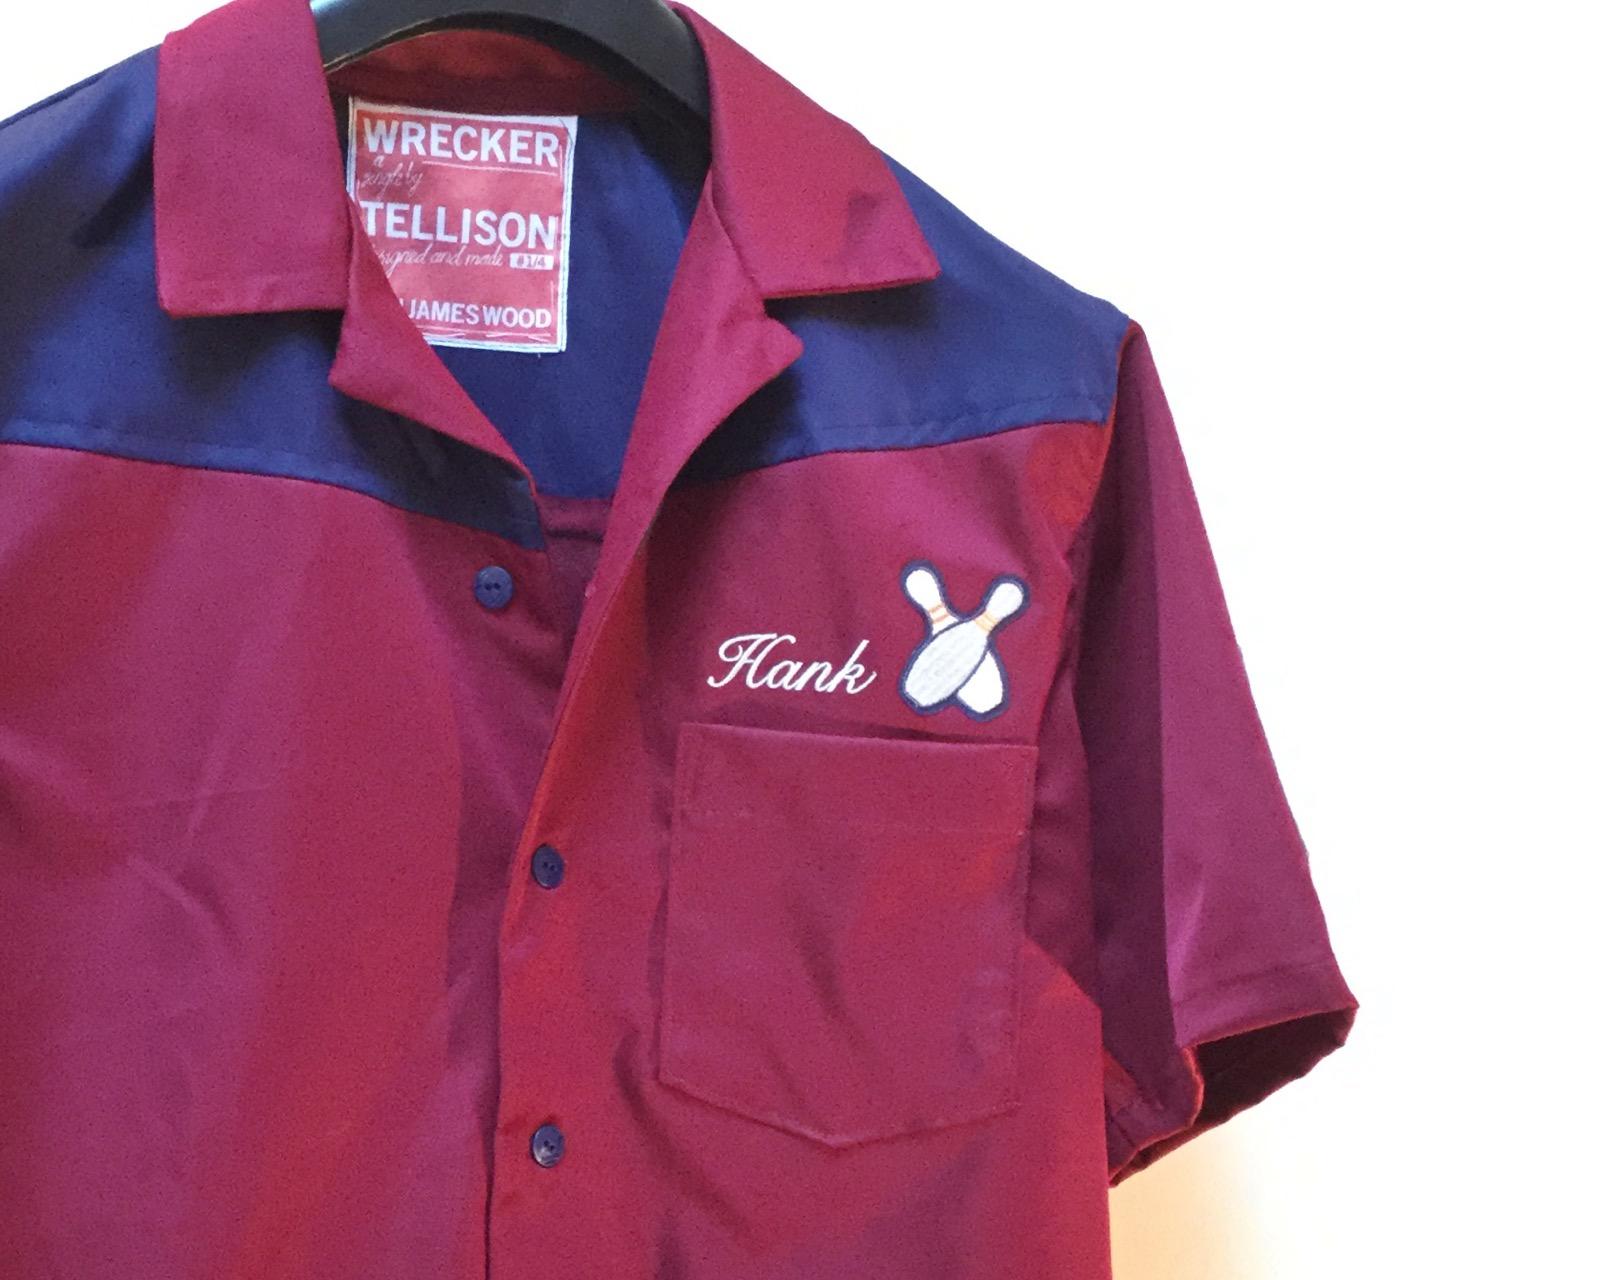 Tellison bowling shirt (Front)